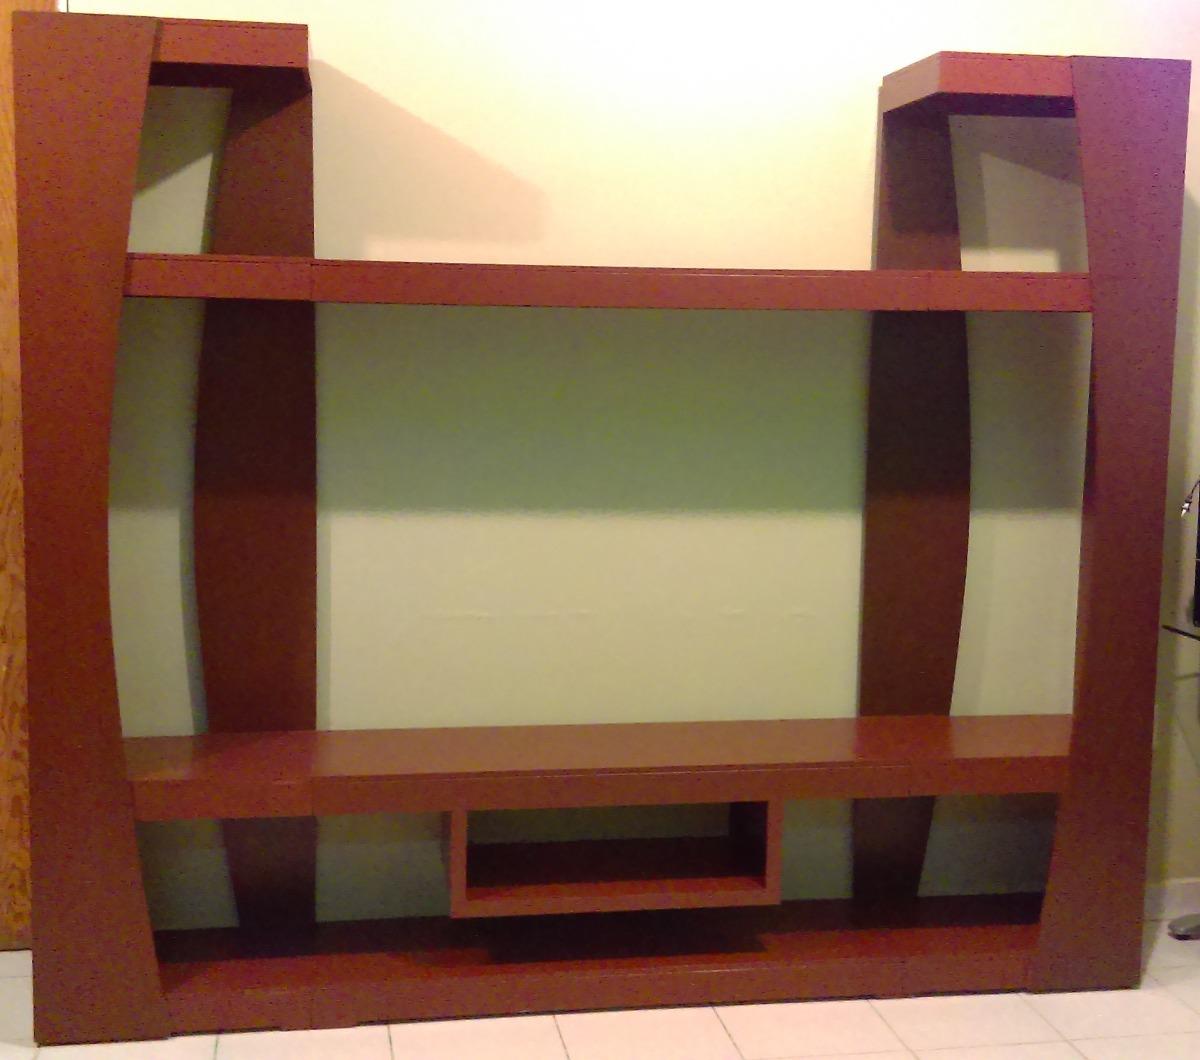 Centro entretenimiento mueble modular para sala de tv Muebles en l para sala